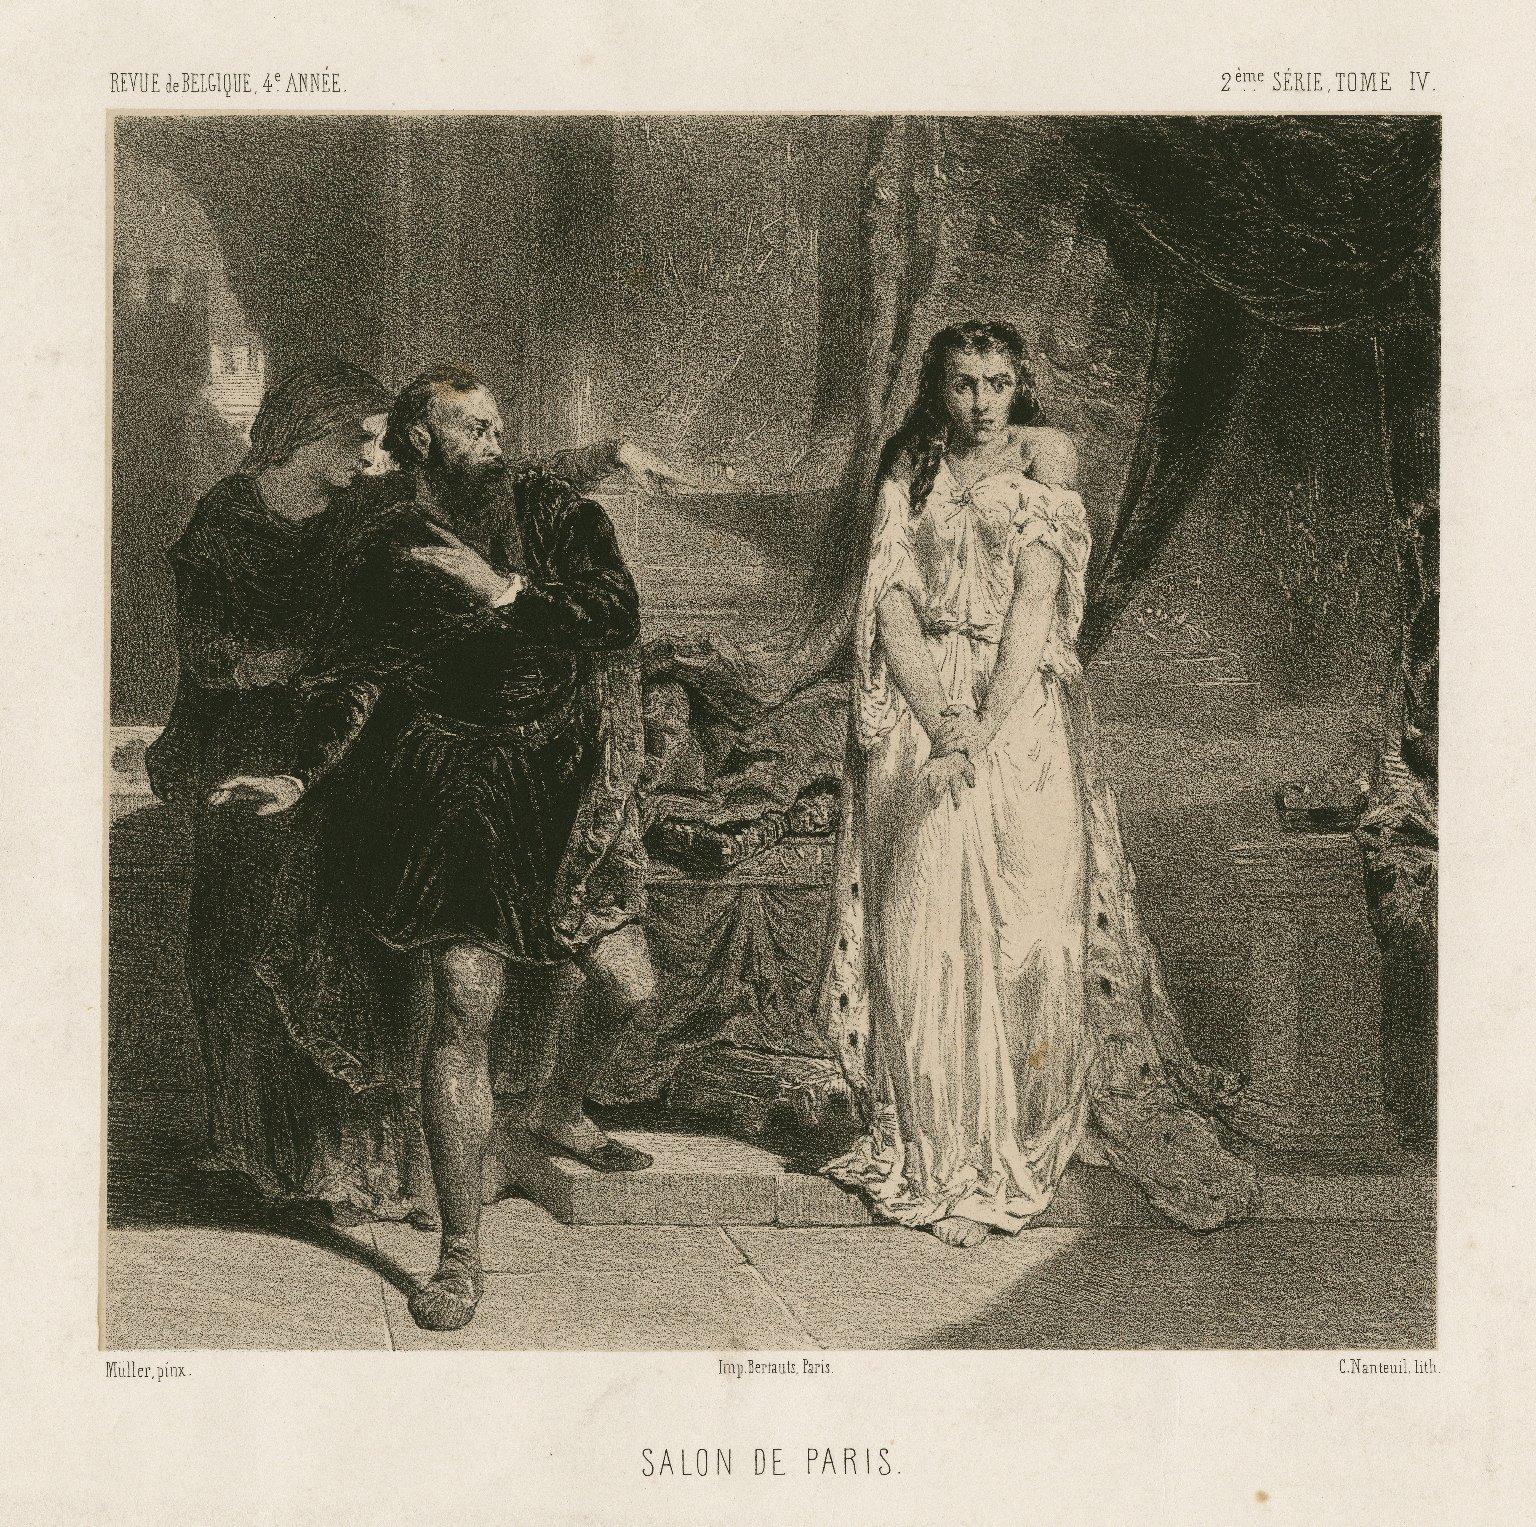 [Lady Macbeth, Macbeth, act V, sc.1] [graphic] / Muller, pinx. ; C. Nanteuil, lith.